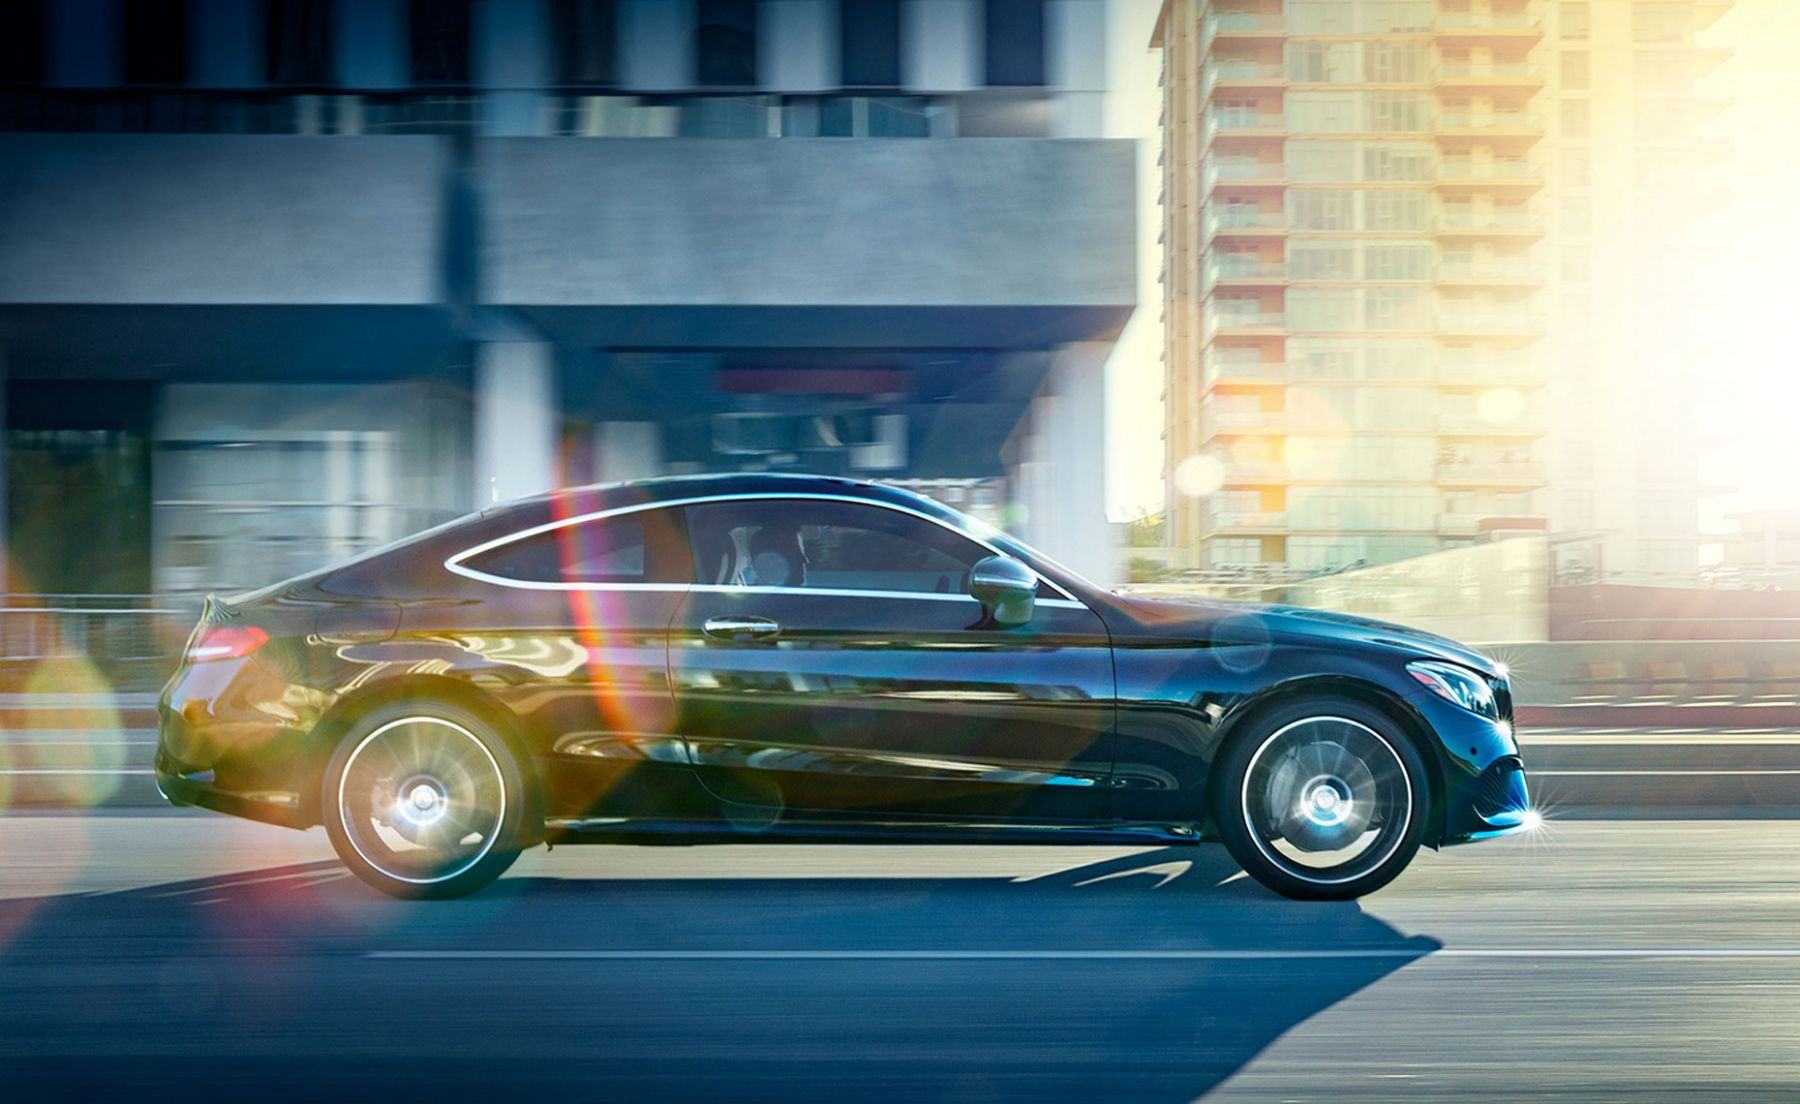 2016-02-MercedesBenzC300-Queensway-3218_V1x